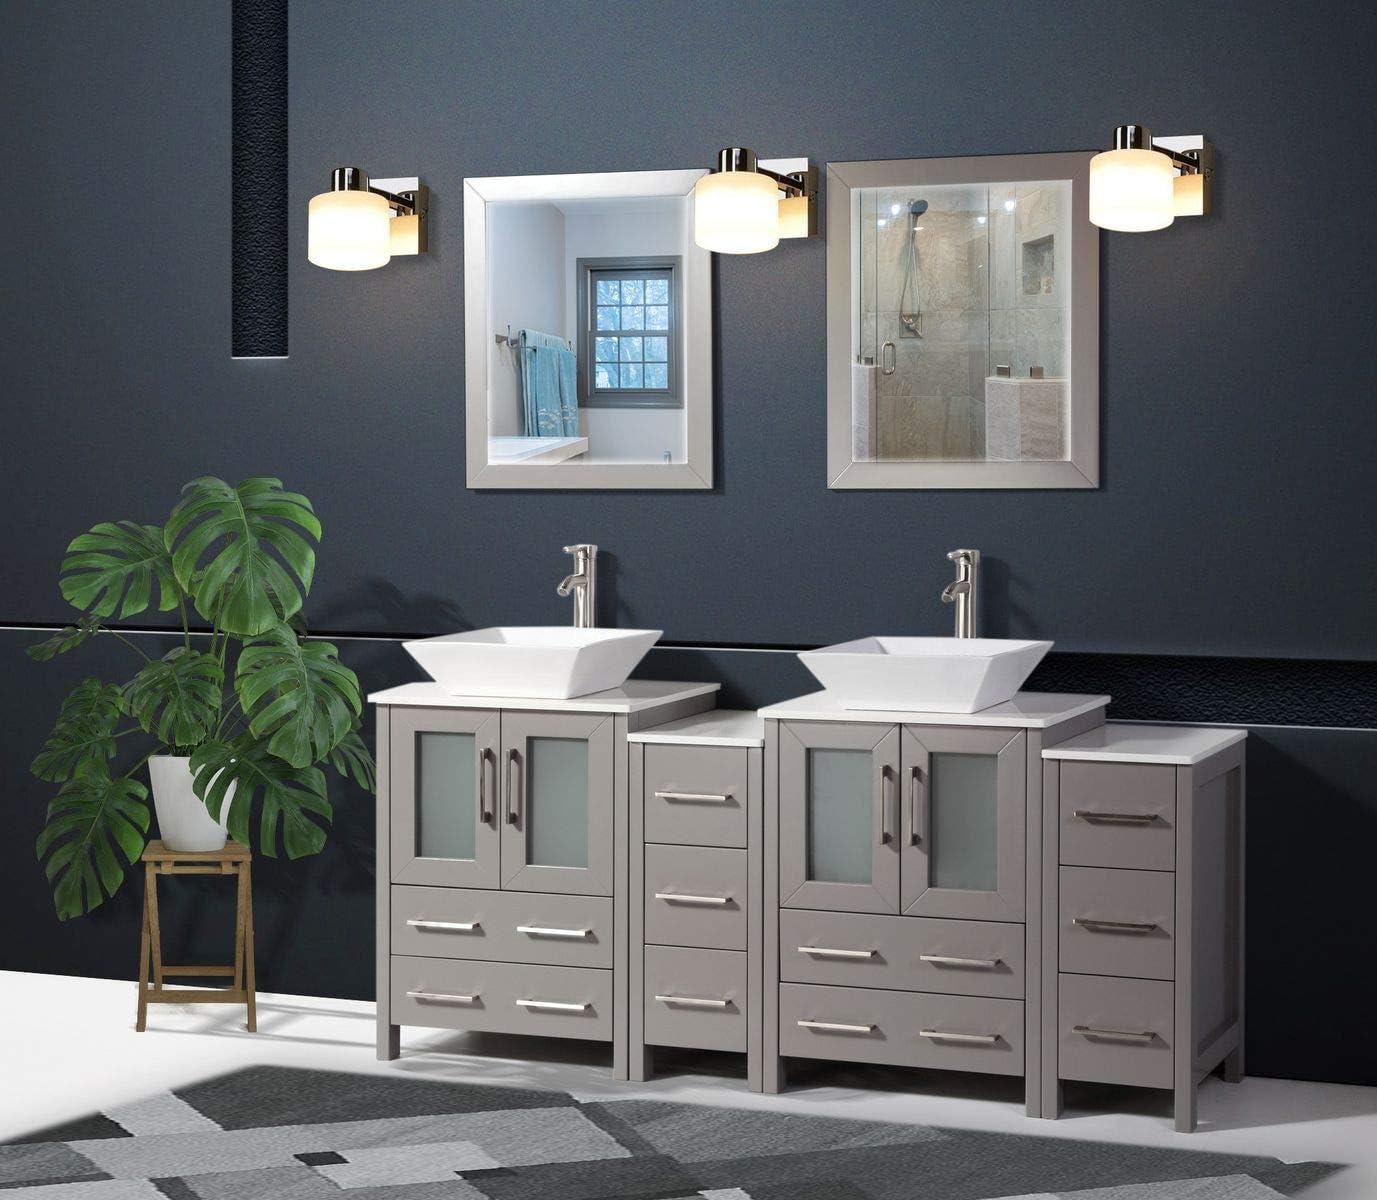 Amazon Com Vanity Art 72 Inch Double Sink Bathroom Vanity Compact Set 4 Cabinets 2 Shelves 10 Drawers Quartz Top And Ceramic Vessel Sink Bathroom Cabinet With Free Mirror Va3124 72 G Kitchen Dining